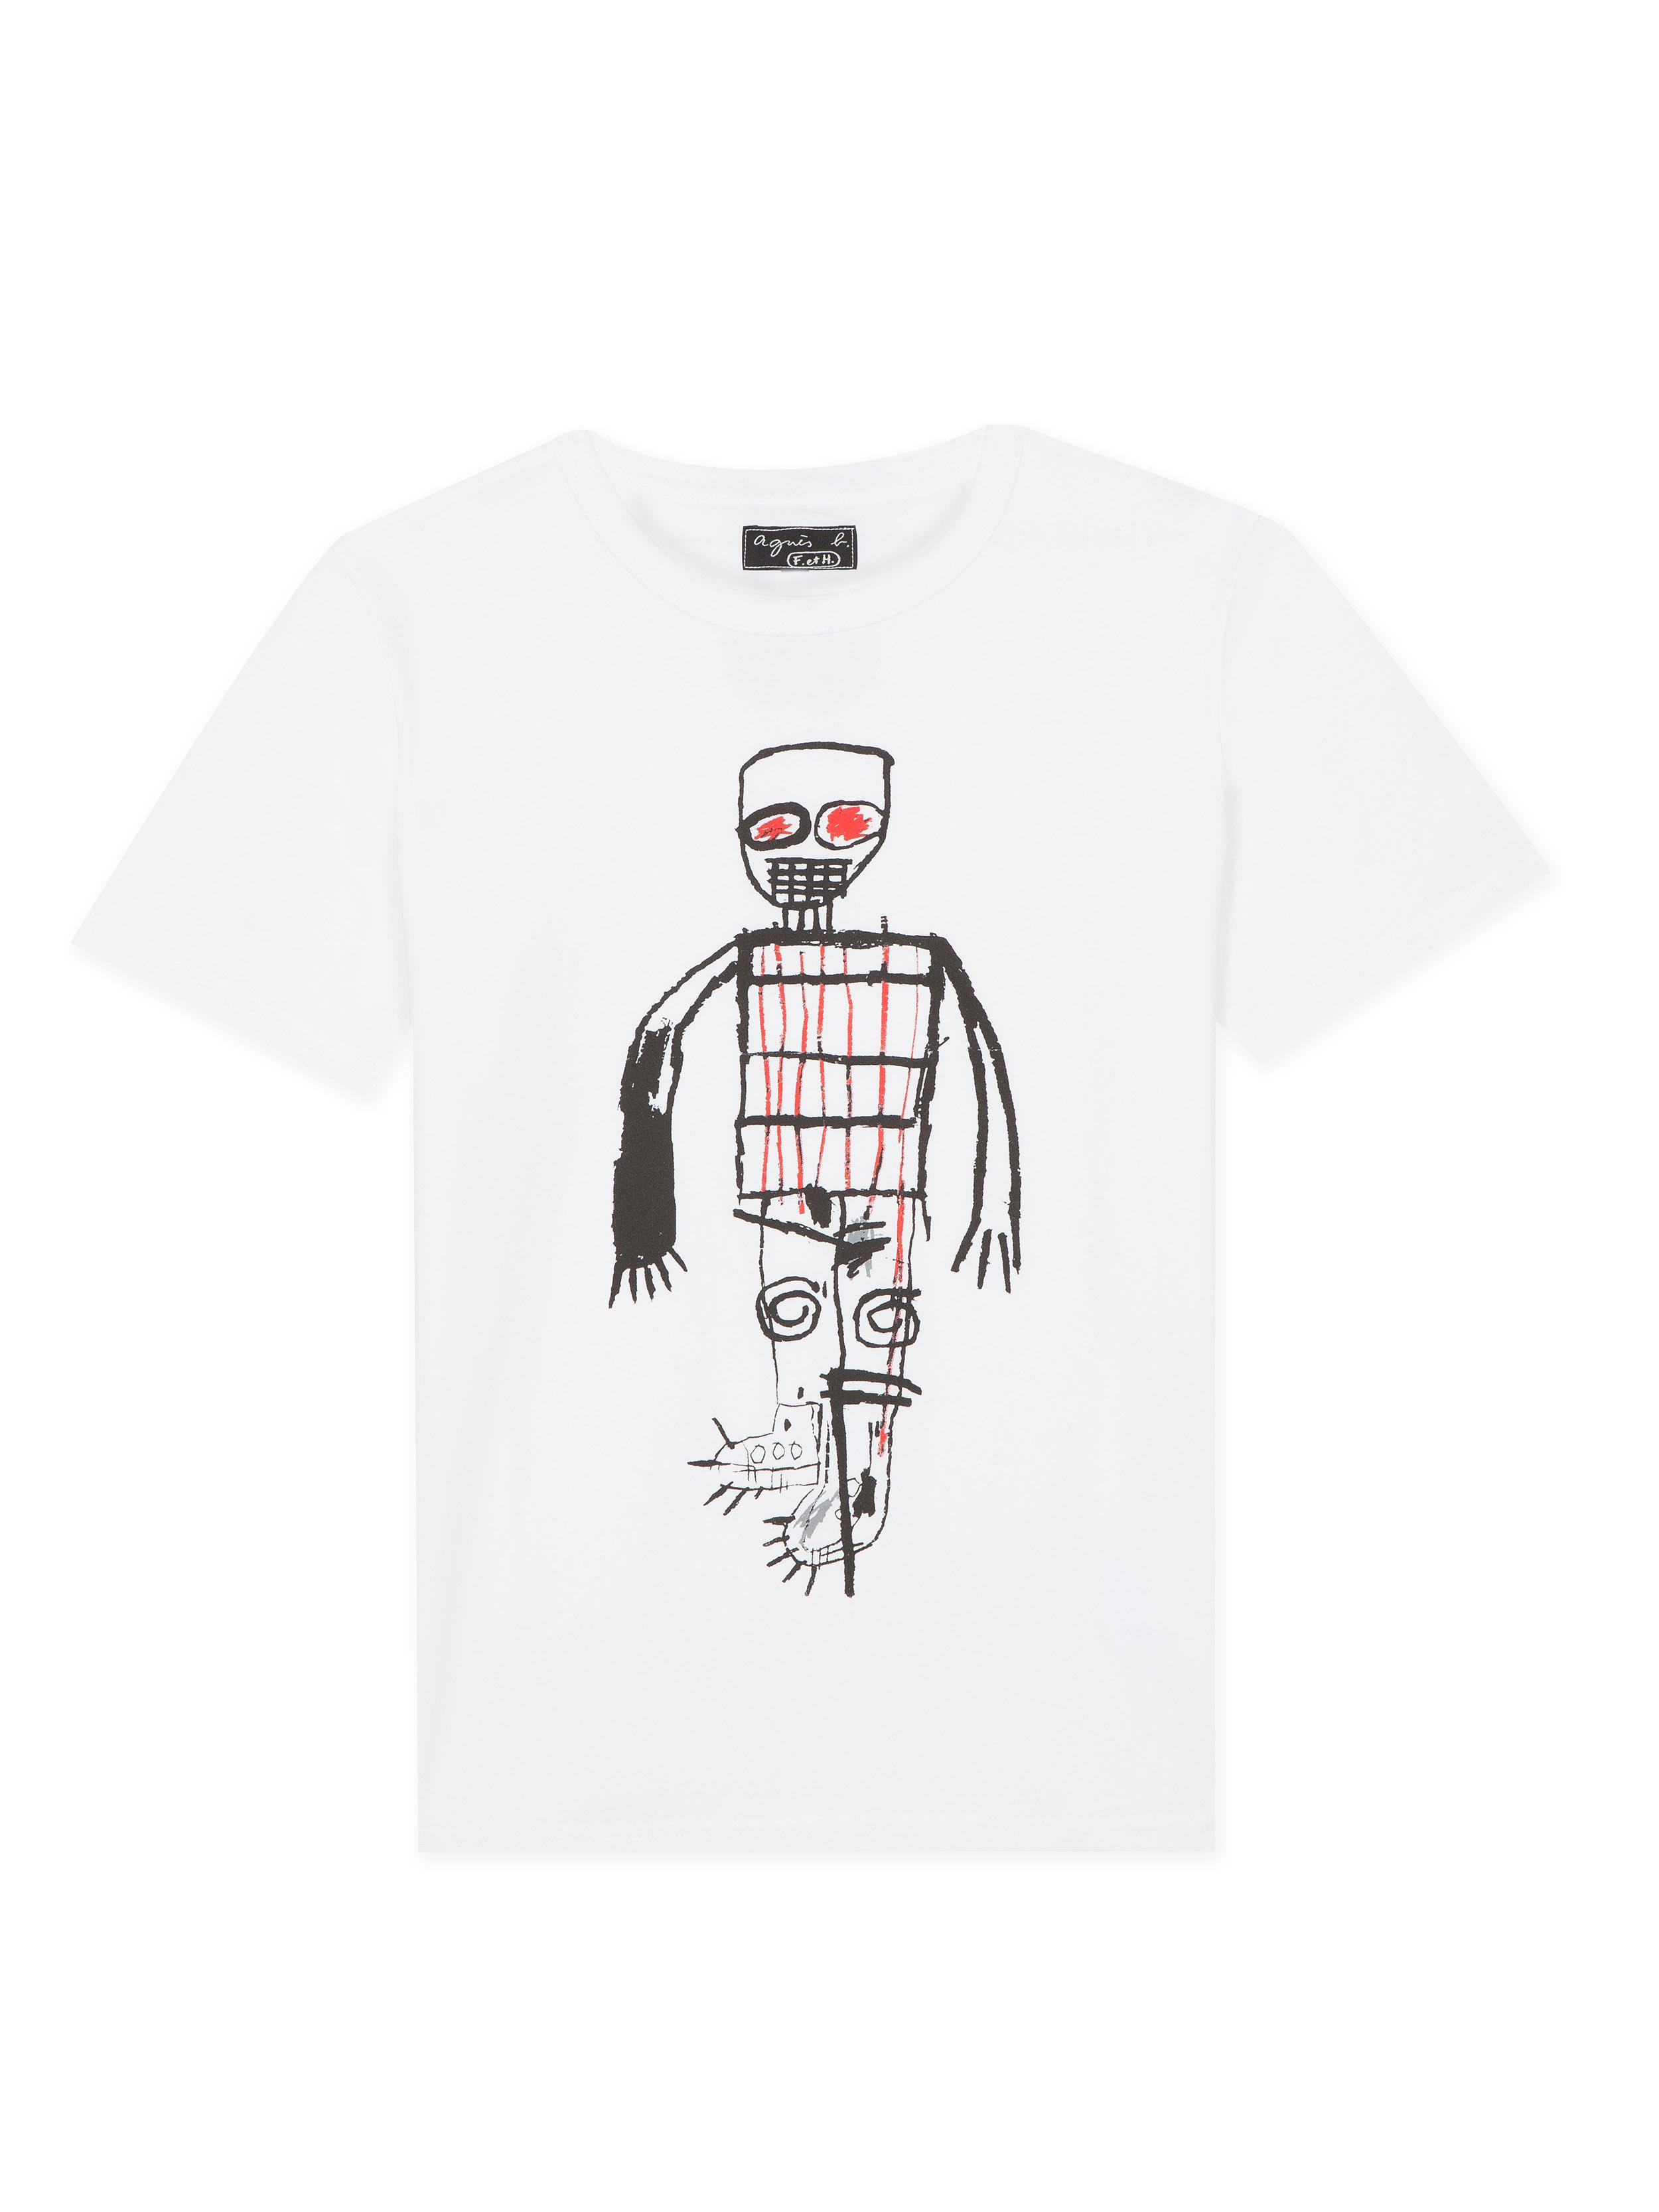 7c23db83a32d agnès b. White Unisex Jean-michel Basquiat T-shirt in White - Lyst